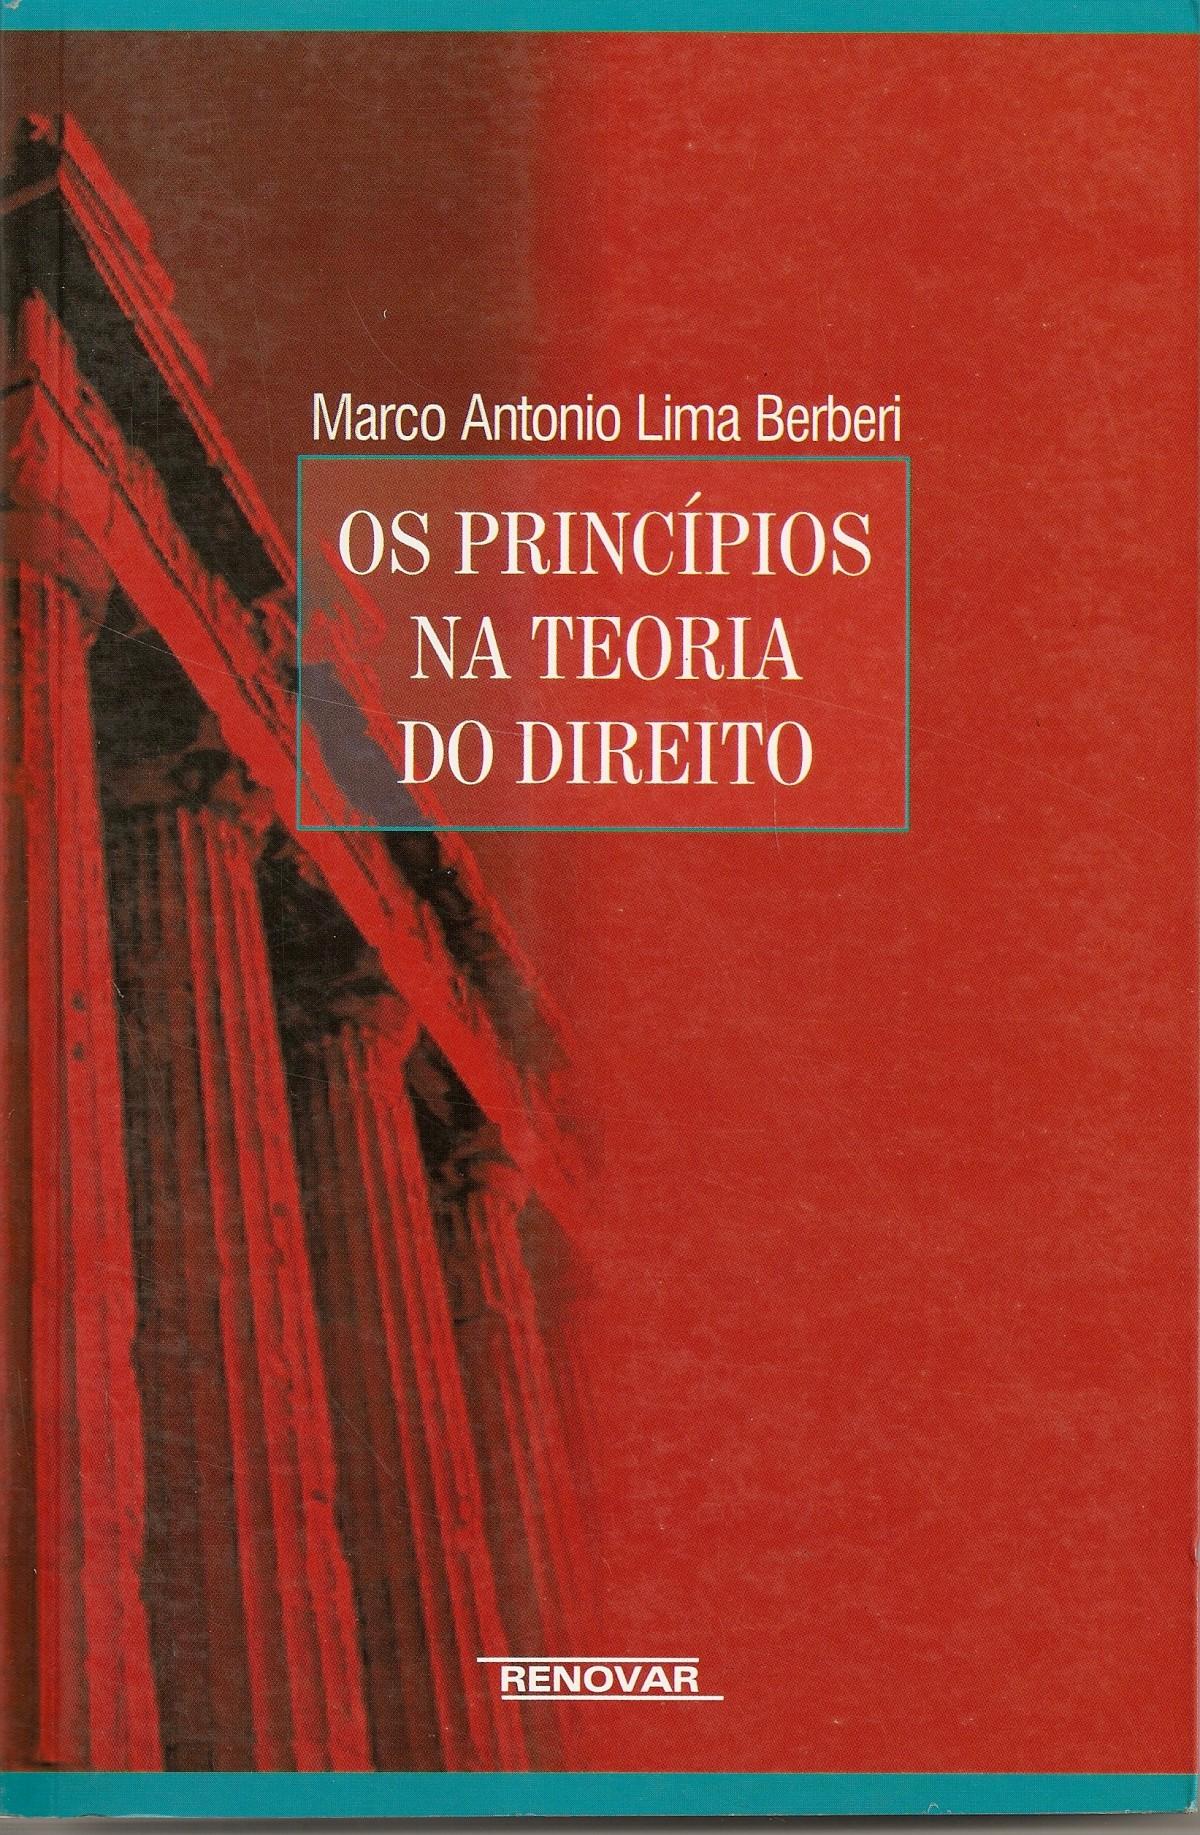 Foto 1 - Os Princípios na Teoria do Direito